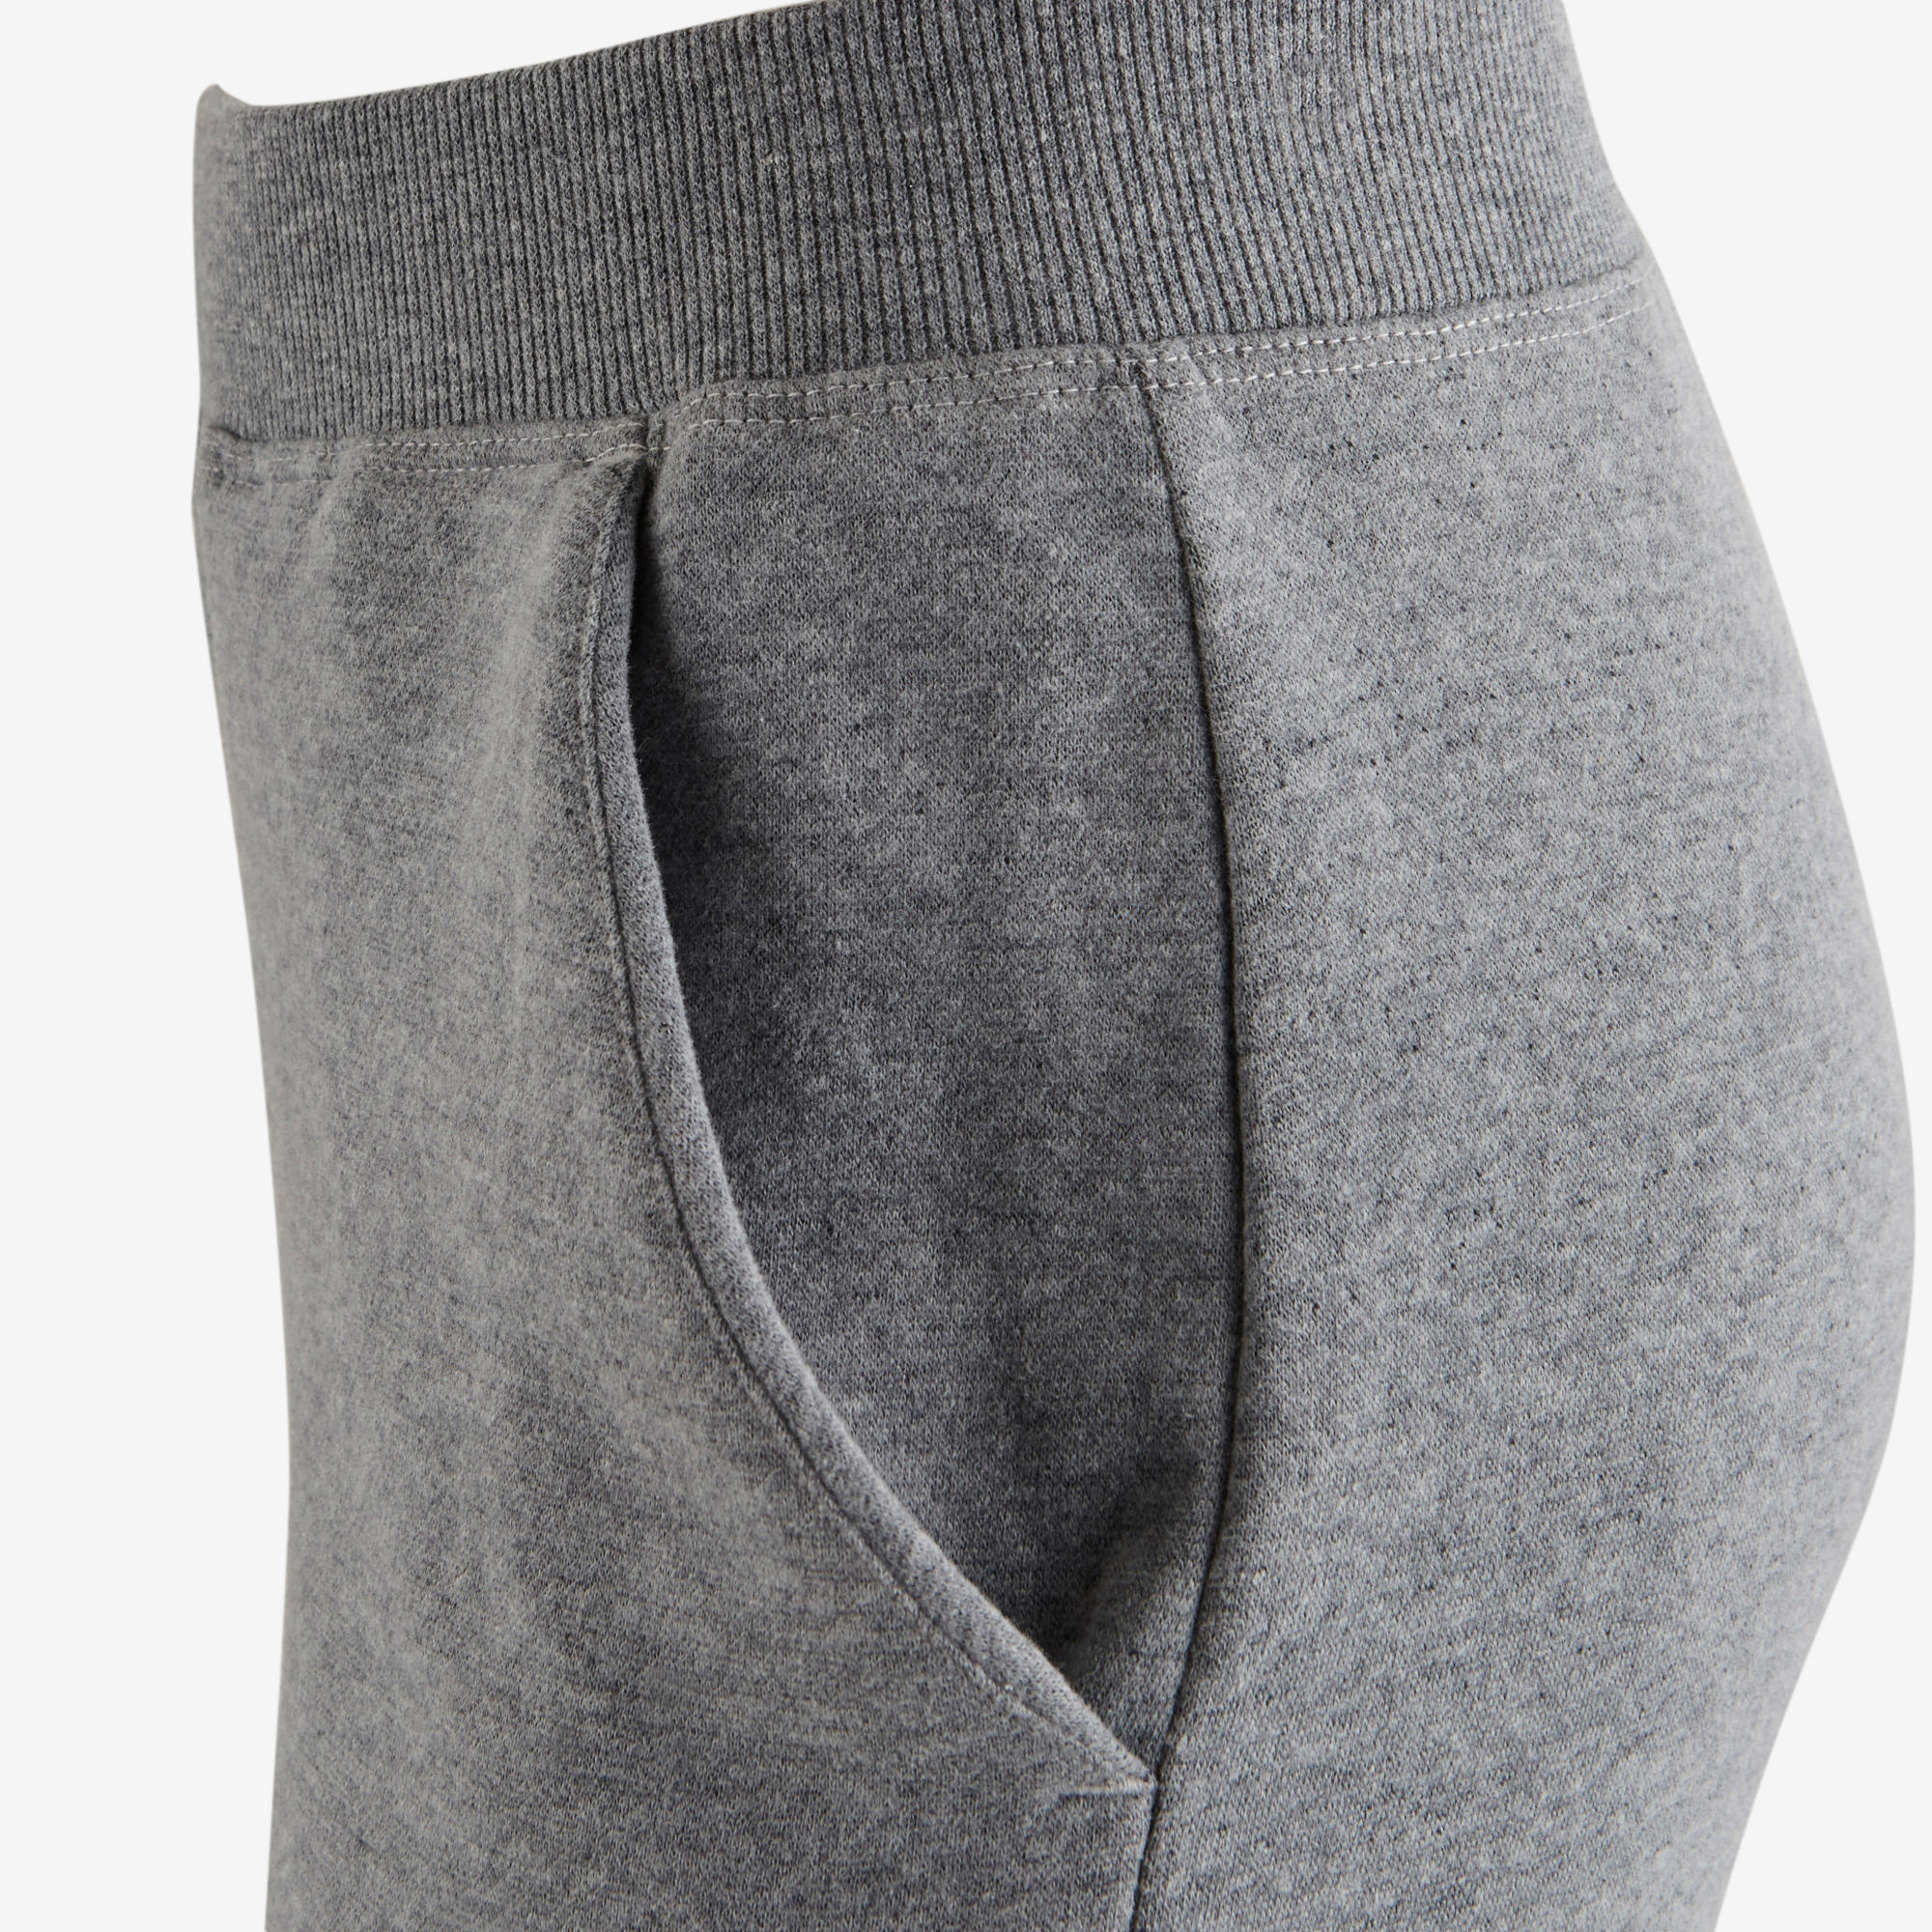 500 Girls' Jersey Gym Bottoms - Light Grey Print